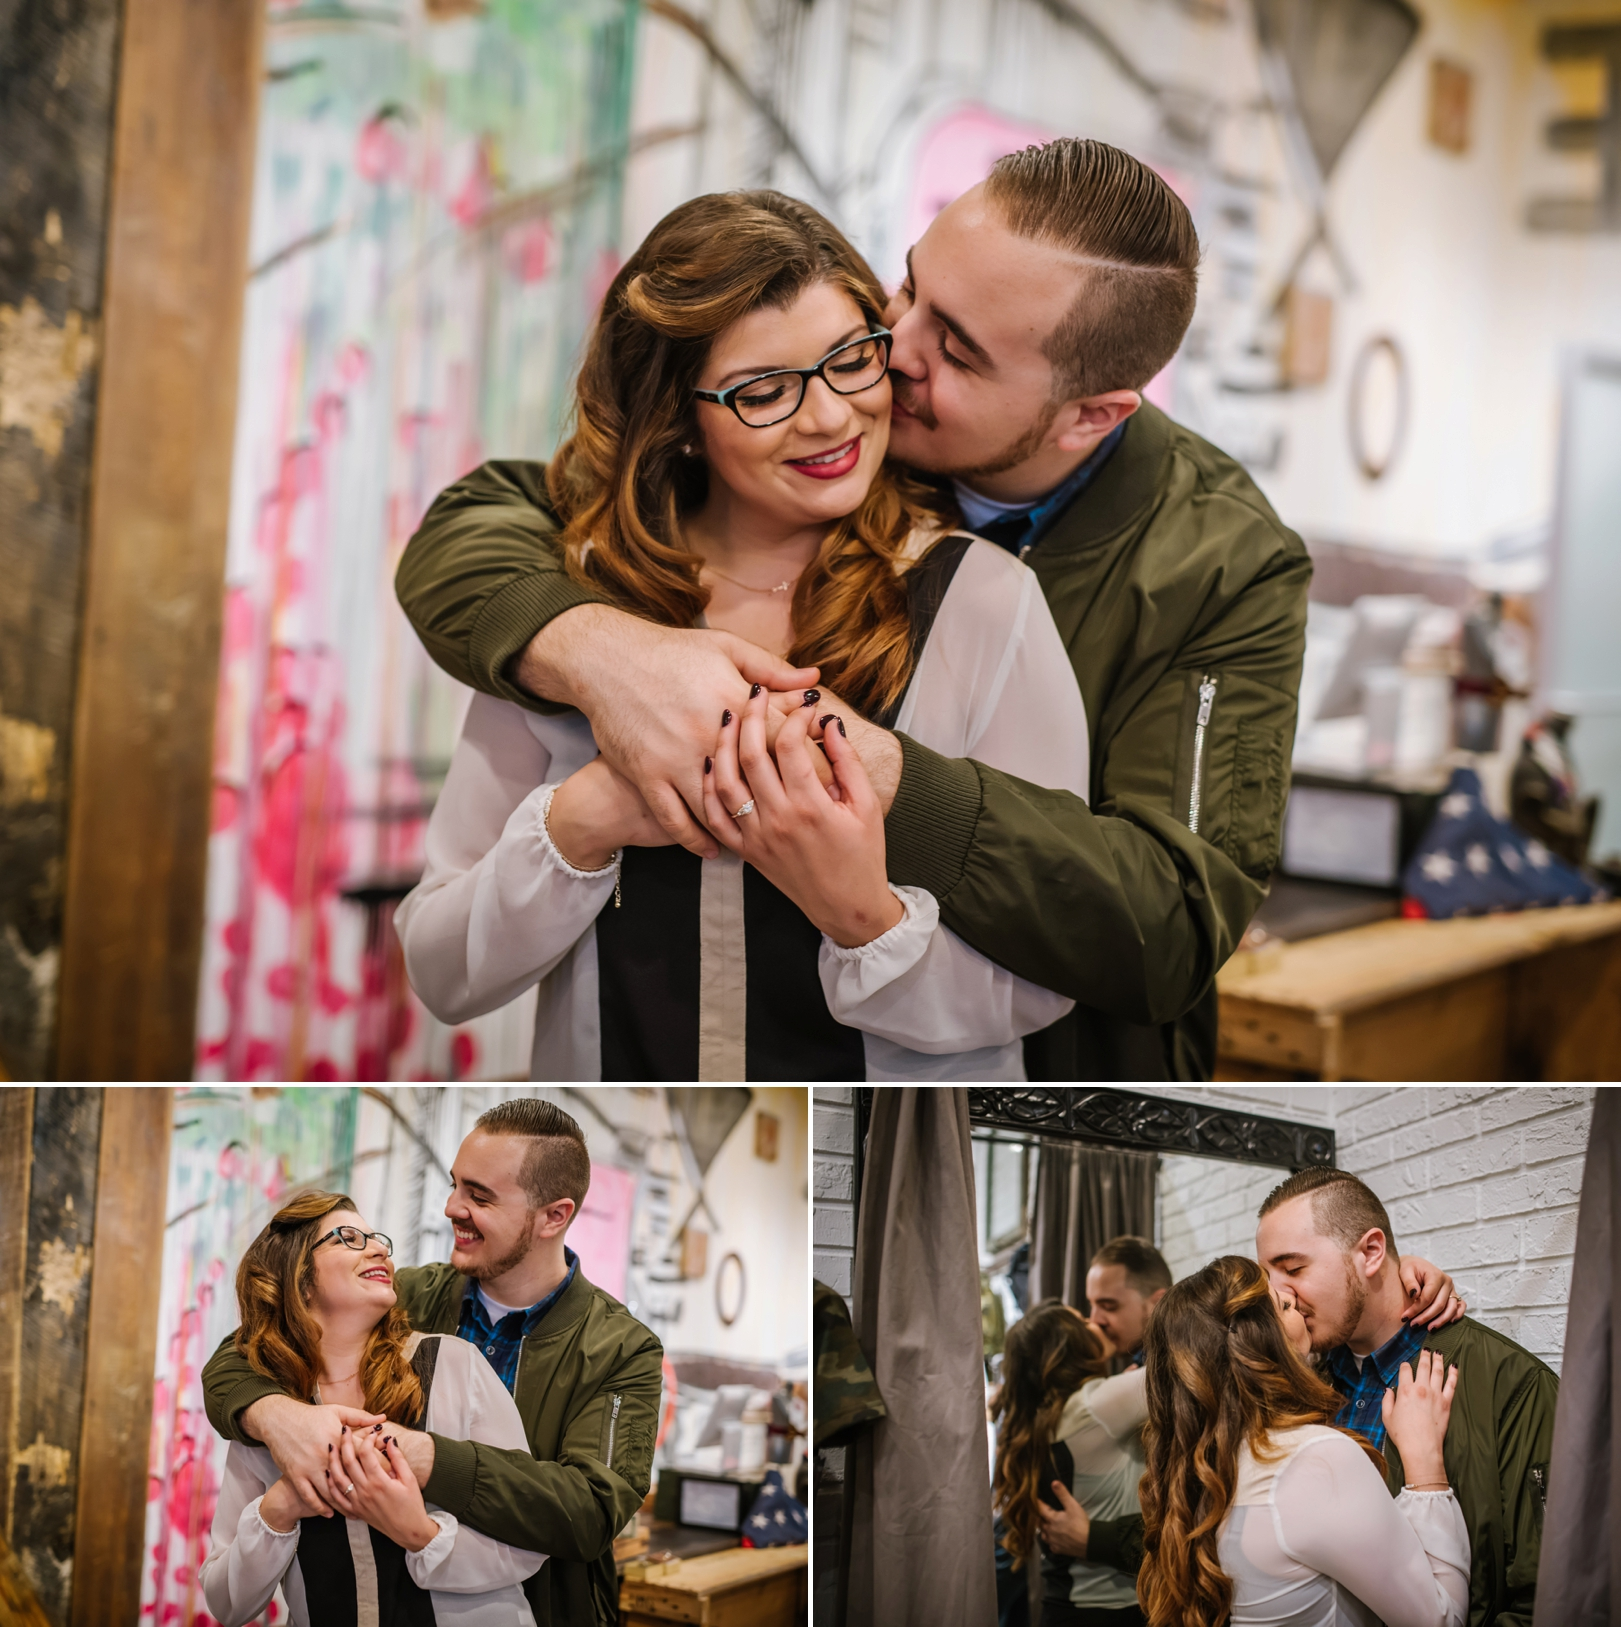 ashlee-hamon-wedding-photography-tampa-urban-cafe-engagement_0002.jpg